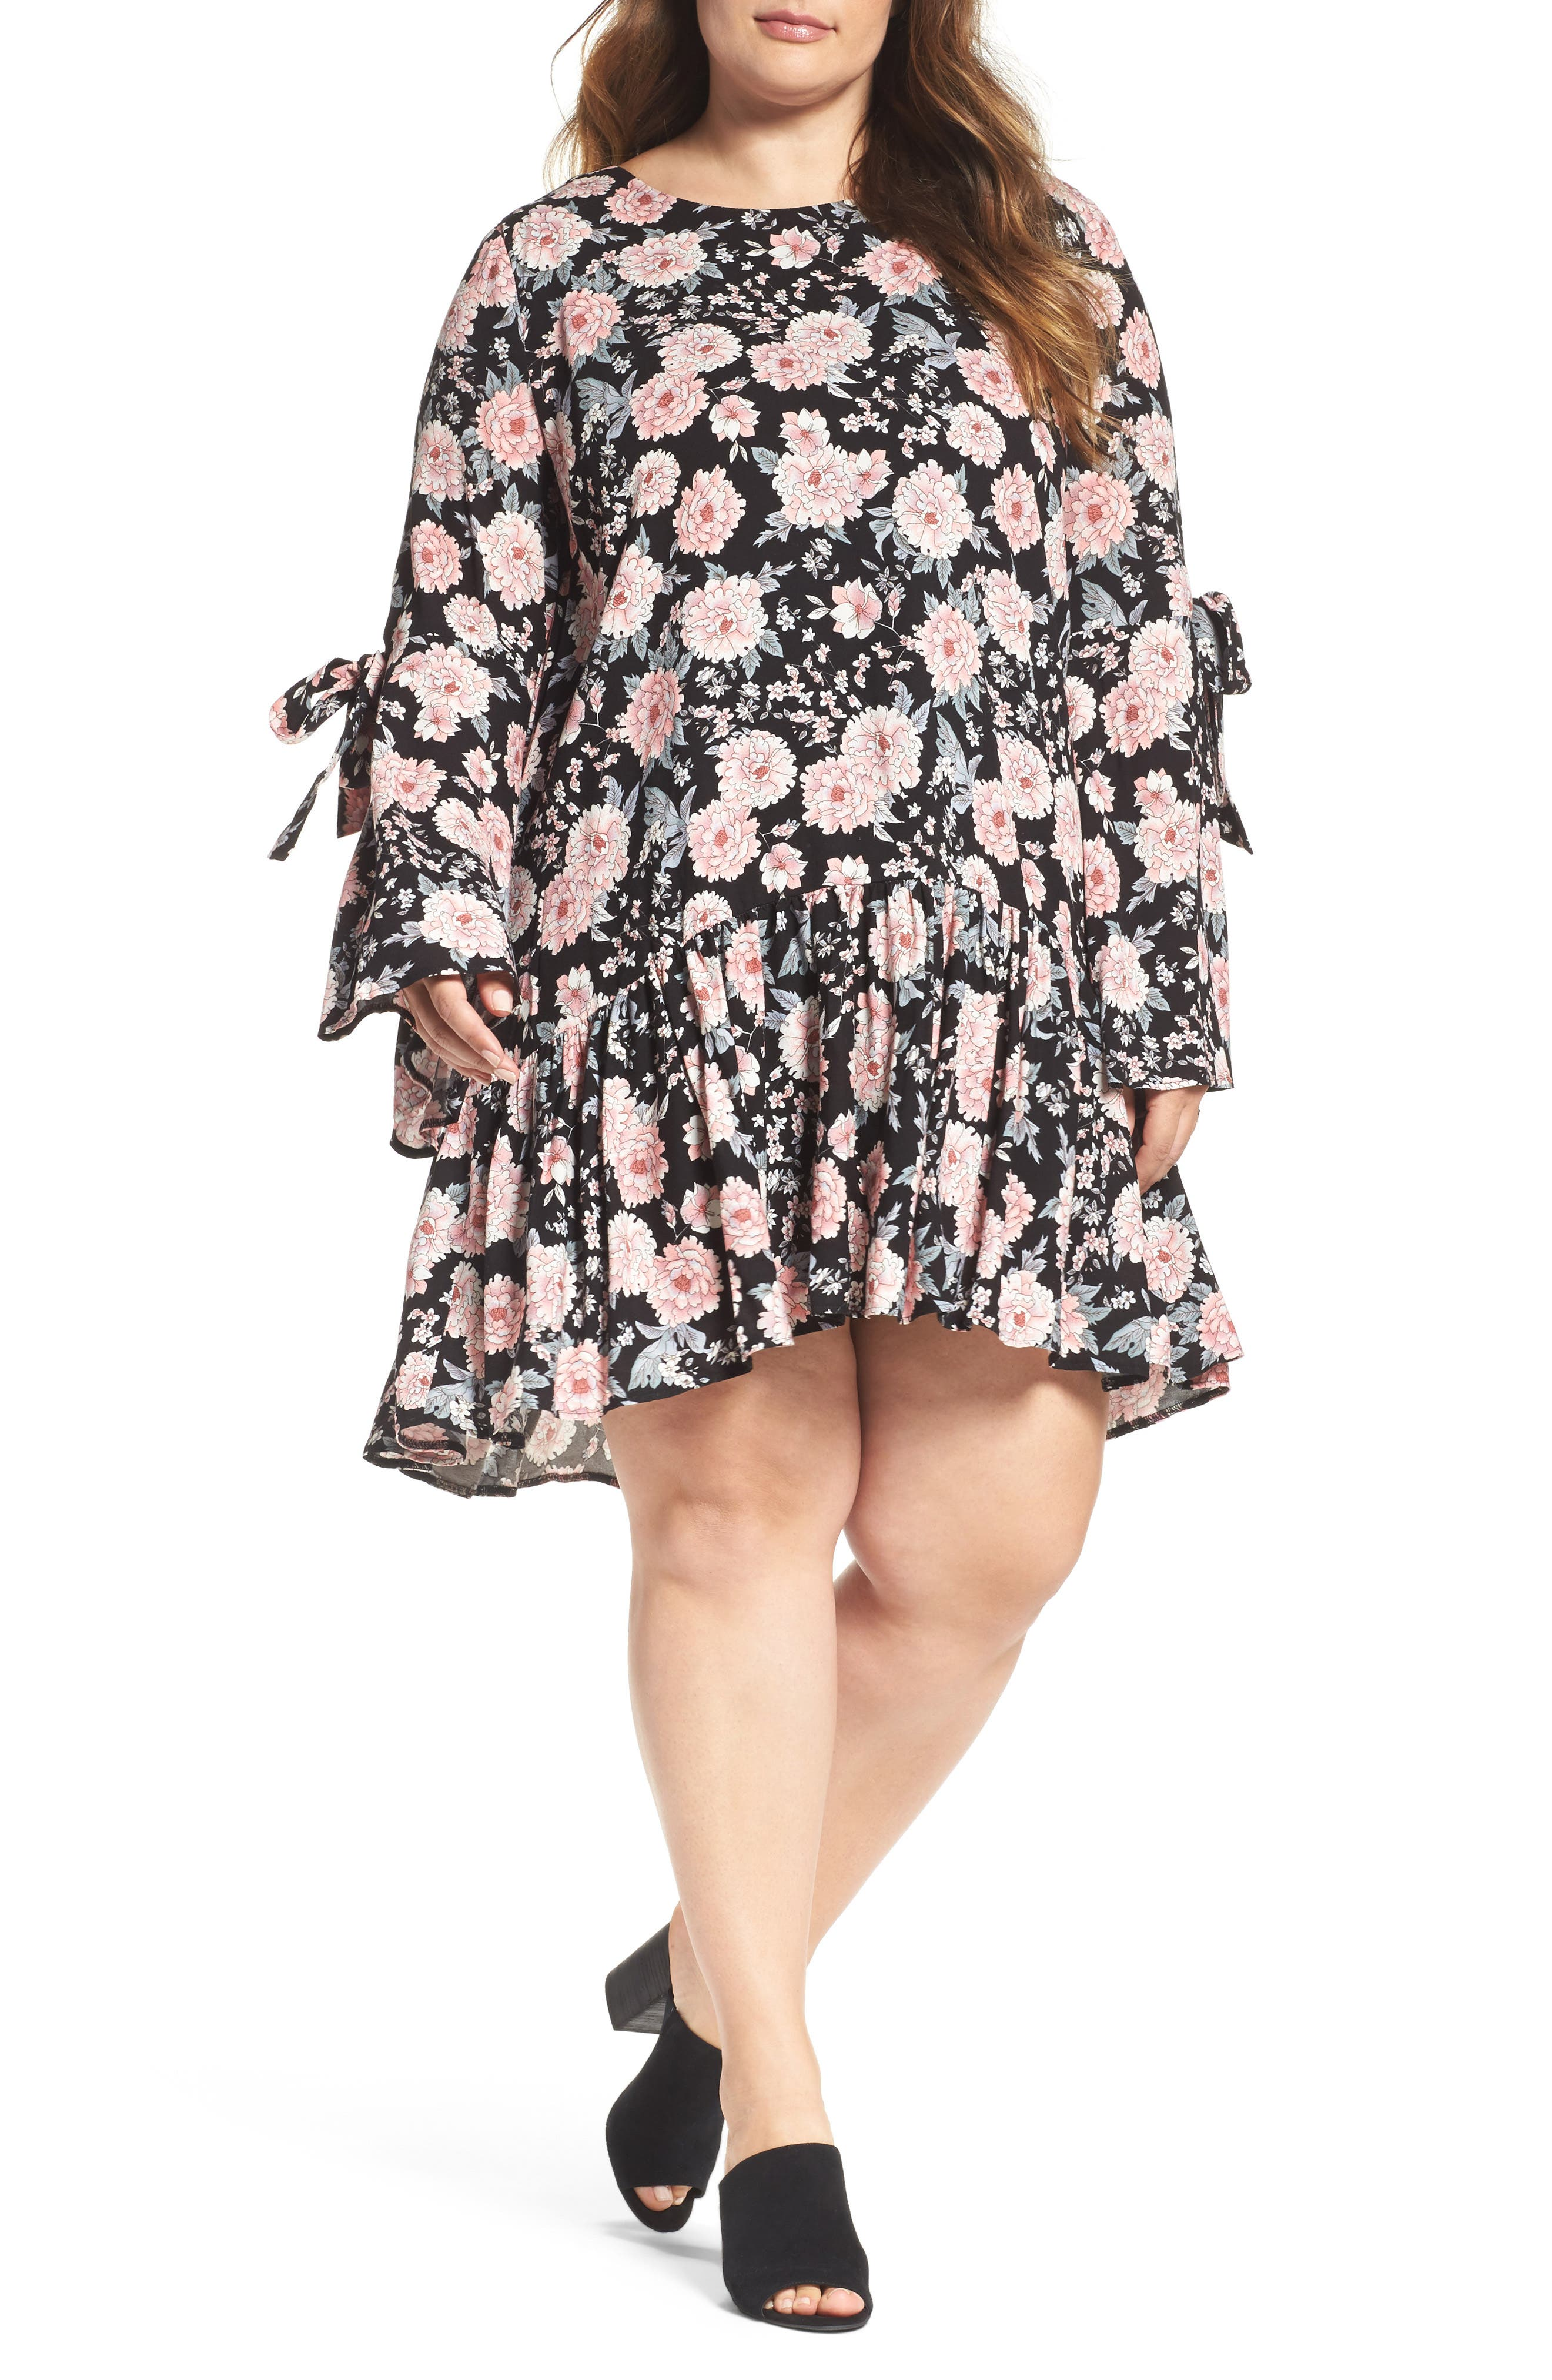 Alternate Image 1 Selected - Glamorous Drop Waist Bell Sleeve Shift Dress (Plus Size)